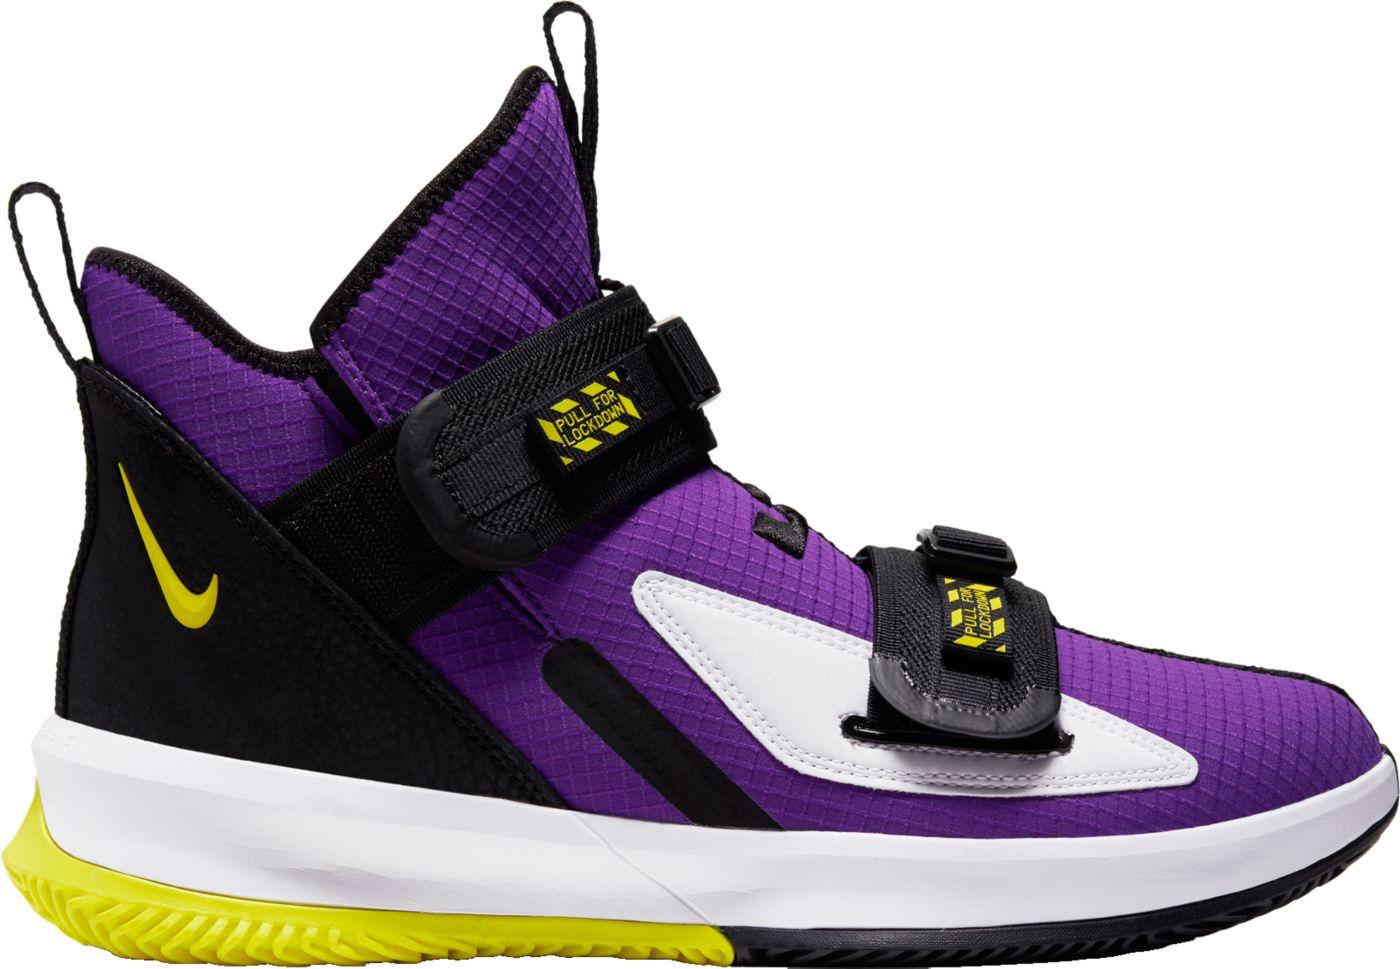 Nike LeBron Soldier 13 SFG Basketball Shoes